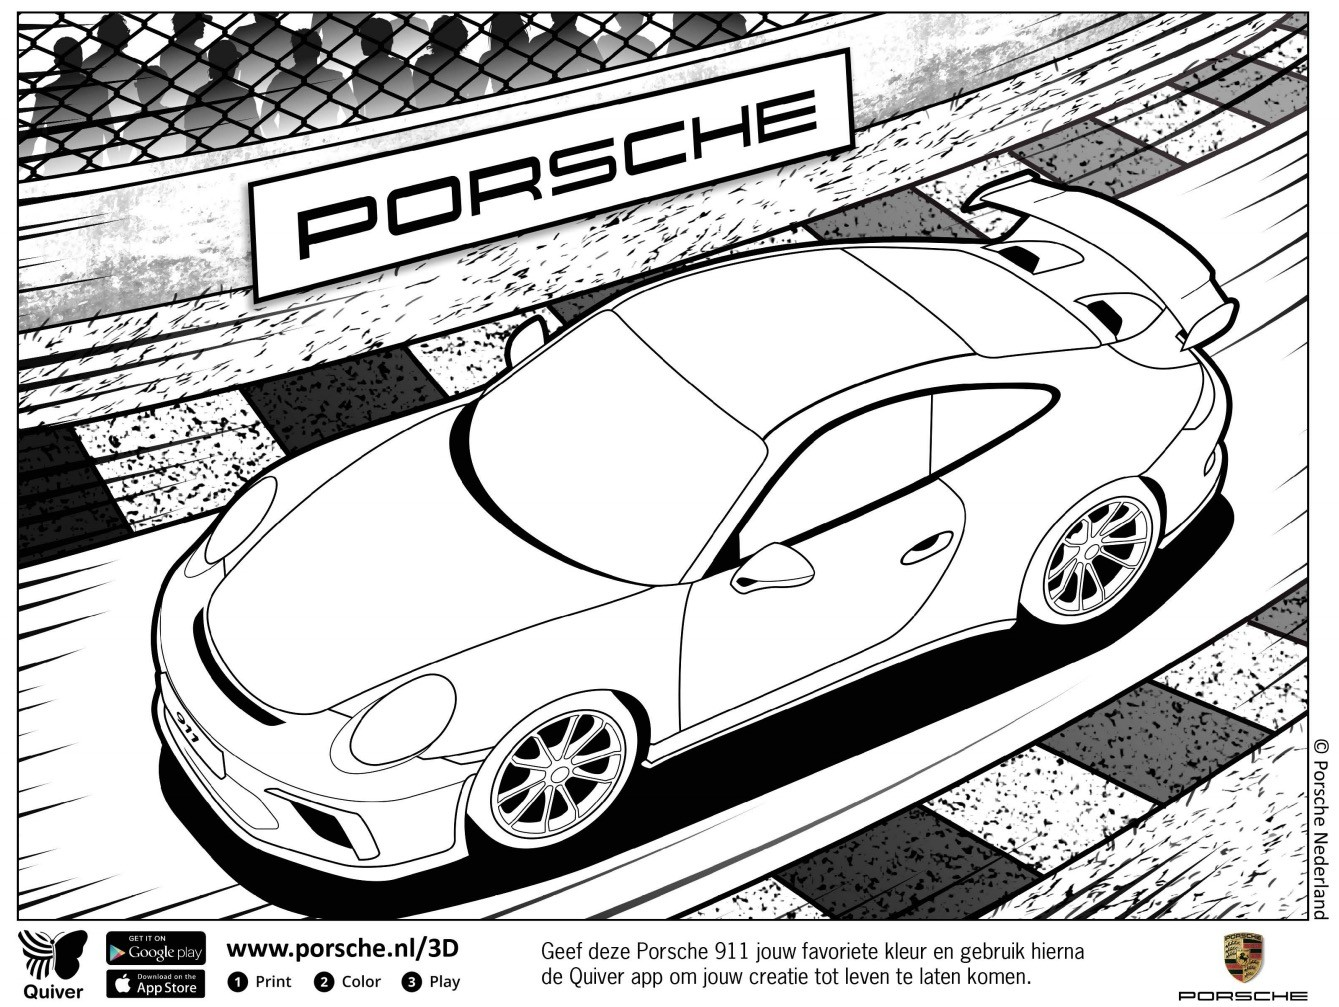 Porsche 911 Gt3 Facelift 991 2 Looks Ready For